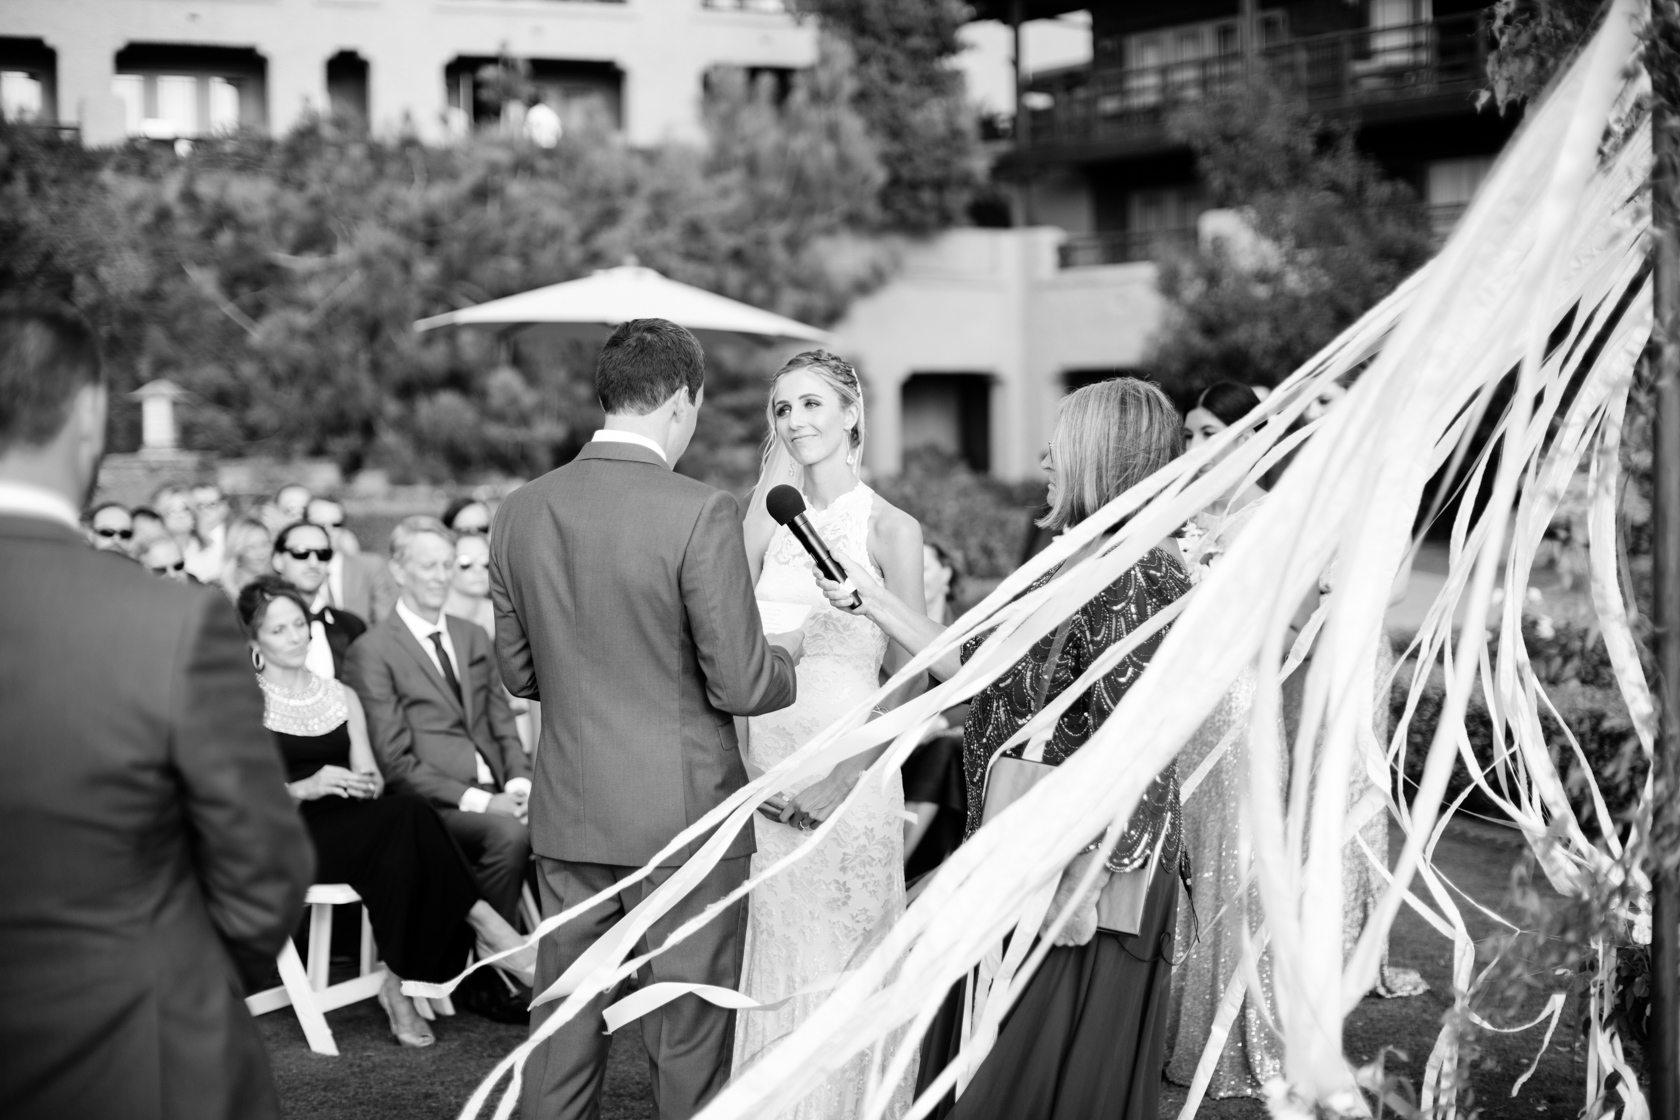 The_Lodge_at_Torrey_Pines_Wedding_063.jpg